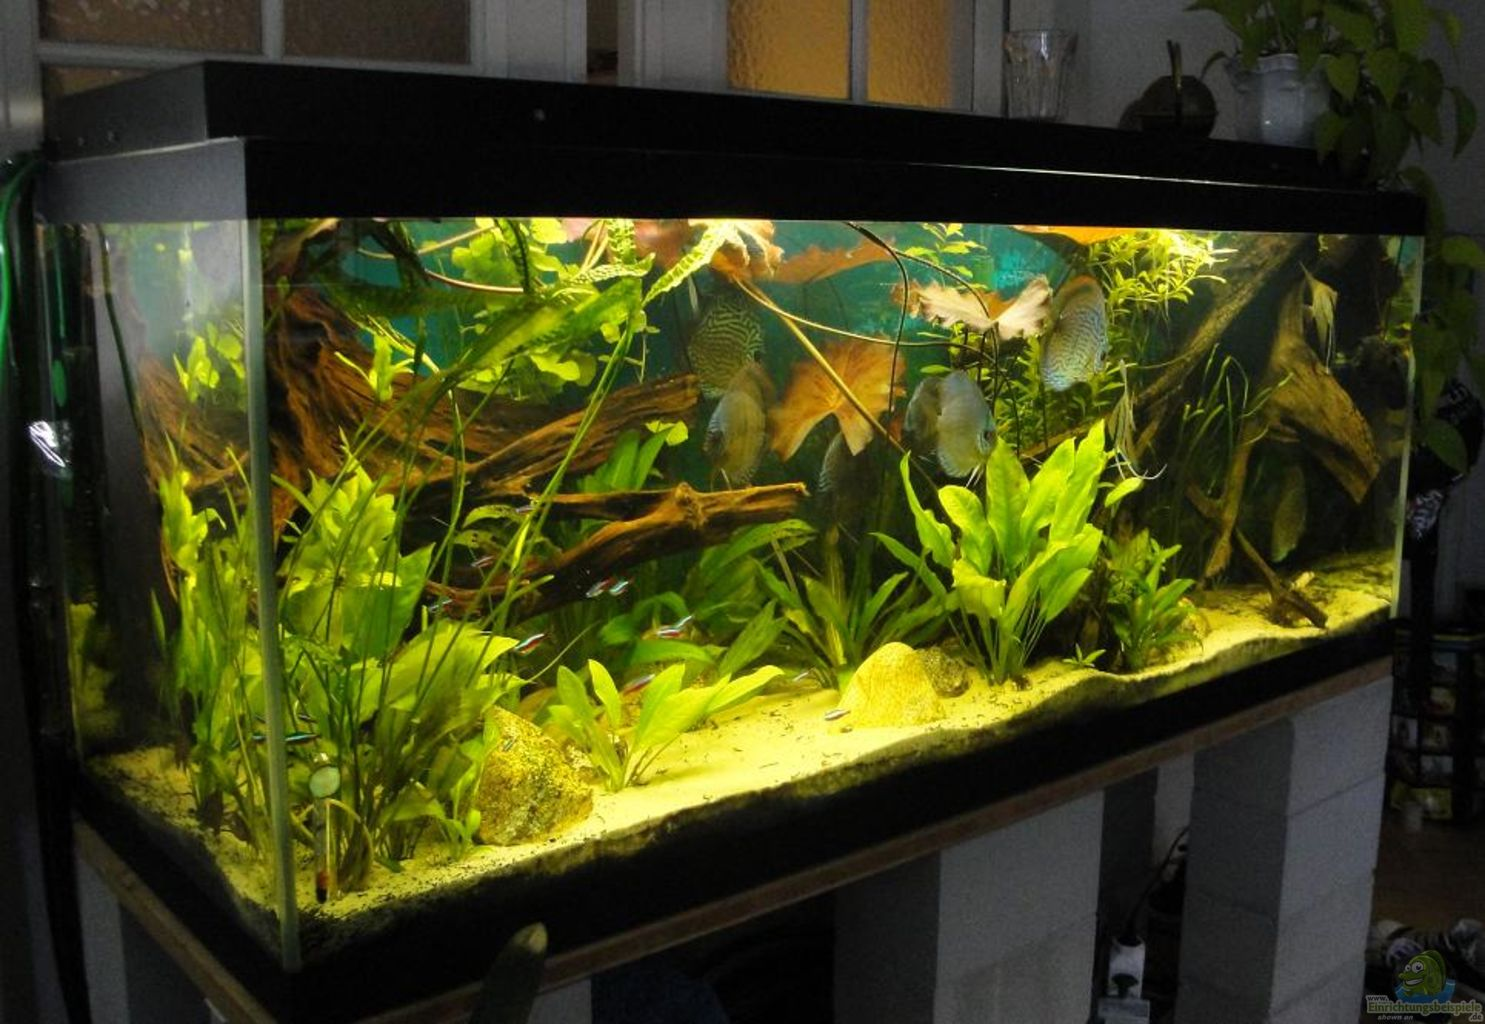 aquarium von laura amazonas existiert nicht mehr. Black Bedroom Furniture Sets. Home Design Ideas